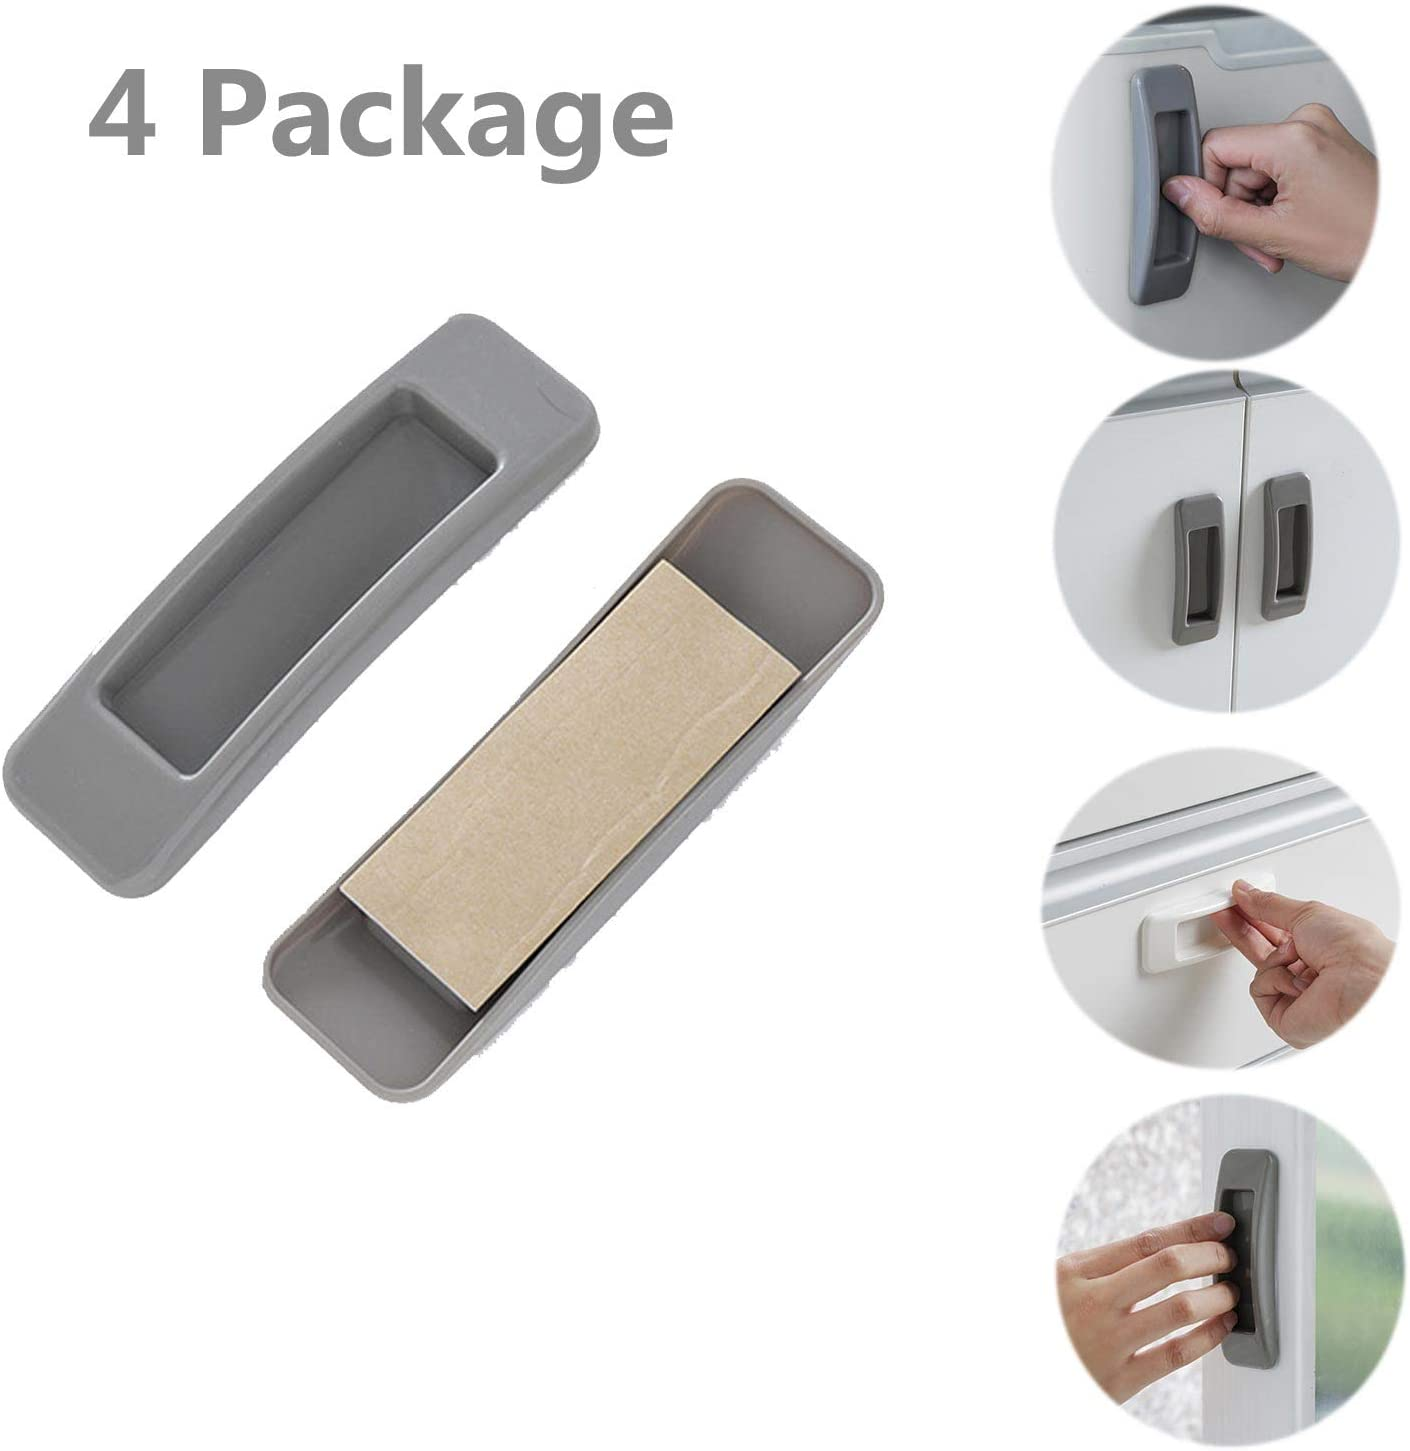 4 Package Self-Stick knob Instant Cabinet Pulls Drawer Handle Window Handle Sticker Window Opening Handle Stick Drawer Opening Handle Stick Knobs Cabinet Door Handle Window Auxiliary Handle